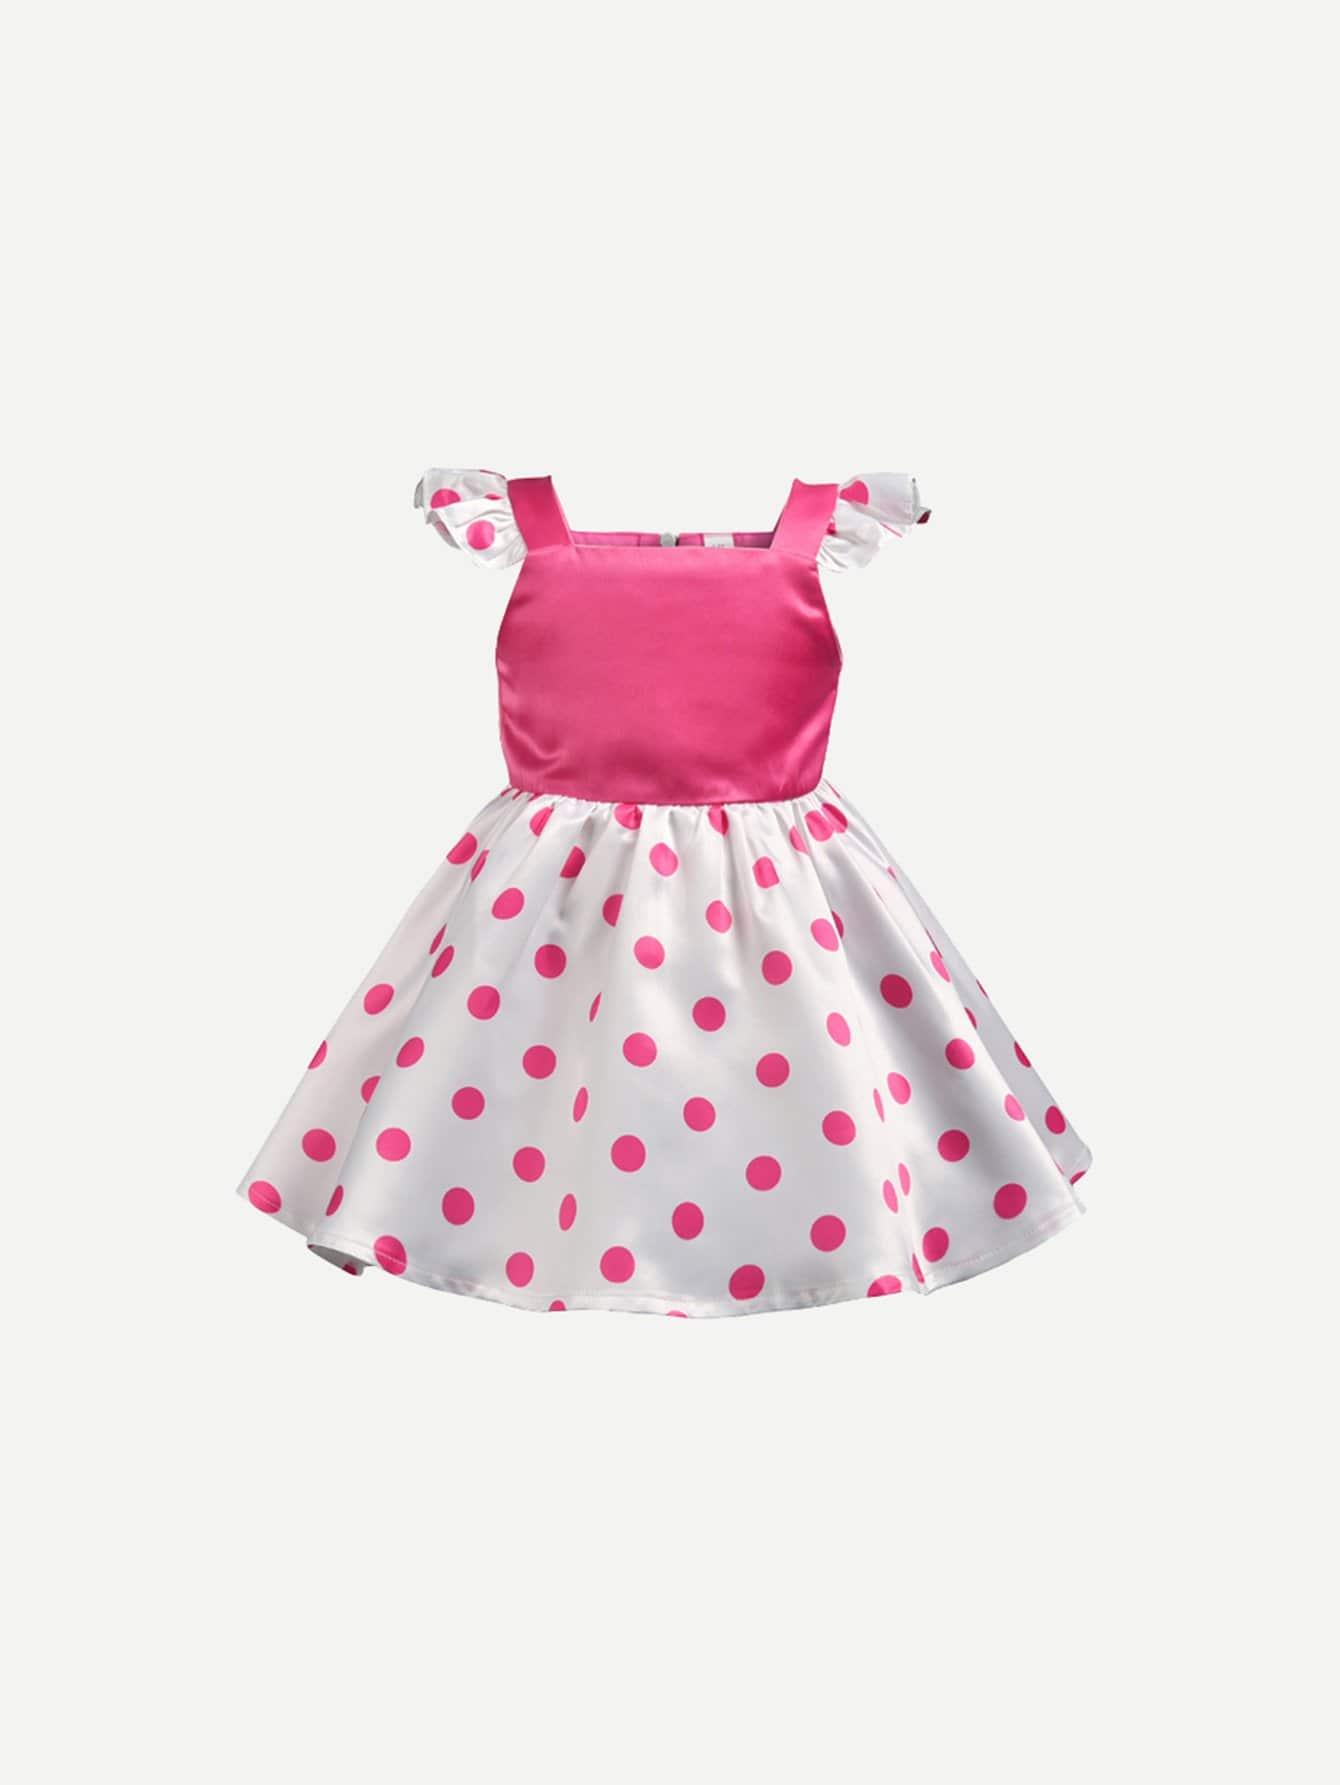 Girls Frill Polka Dot Dress girls frill trim polka dot dress